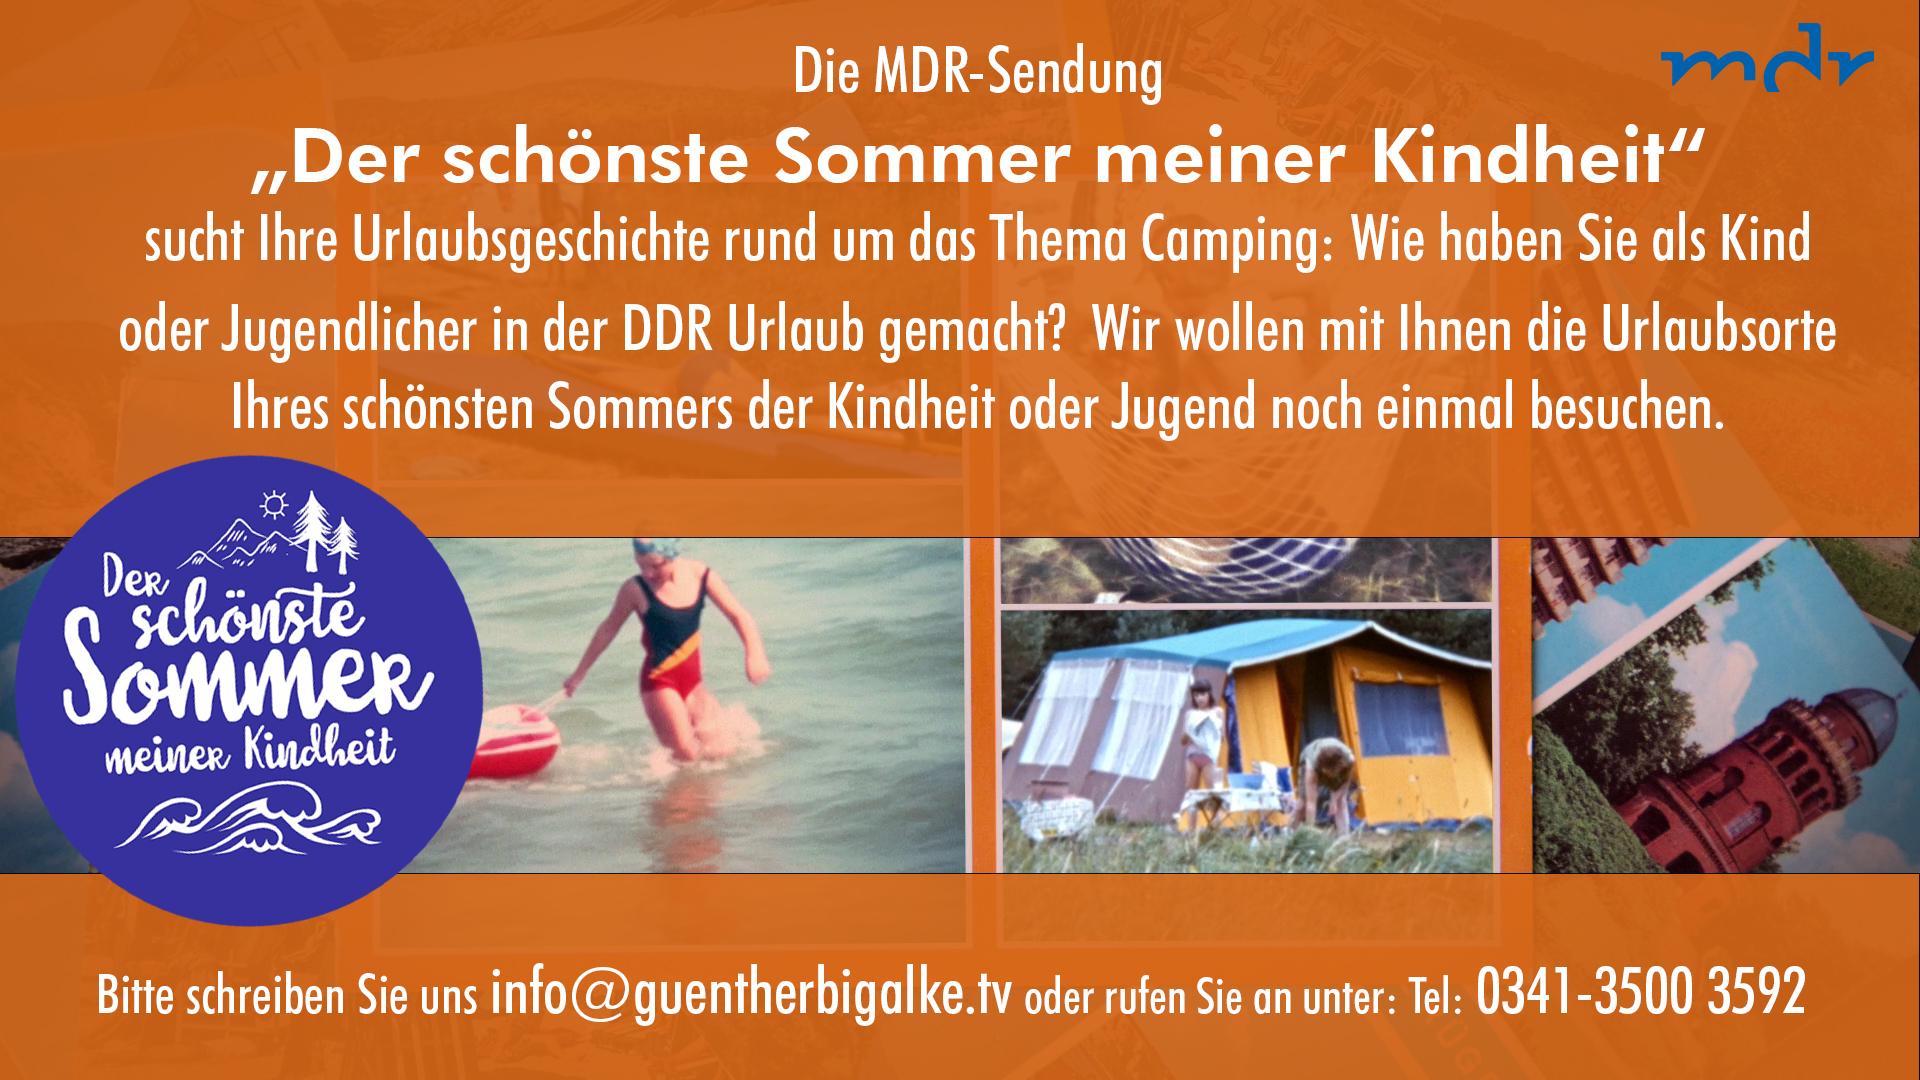 MDR-Sendung